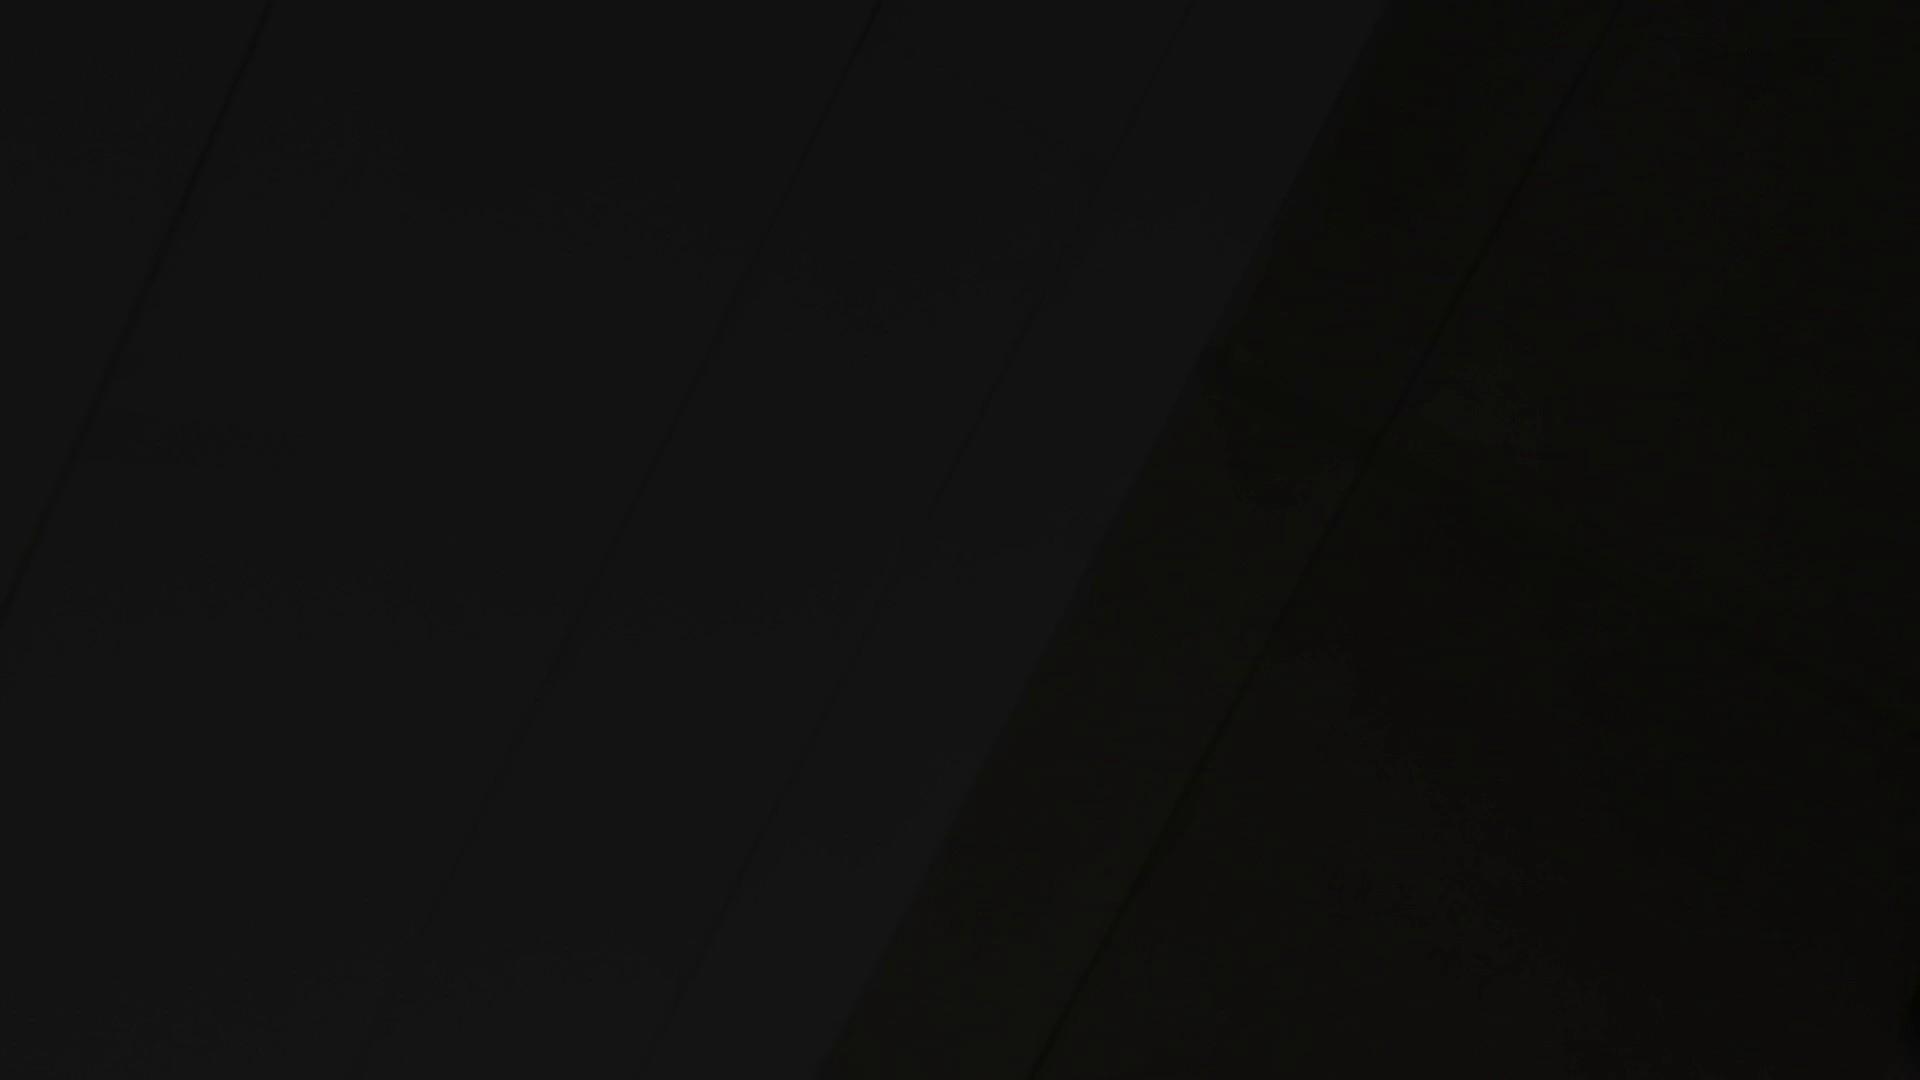 芸術大学ガチ潜入盗撮 JD盗撮 美女の洗面所の秘密 Vol.80 盛合せ  79PIX 50